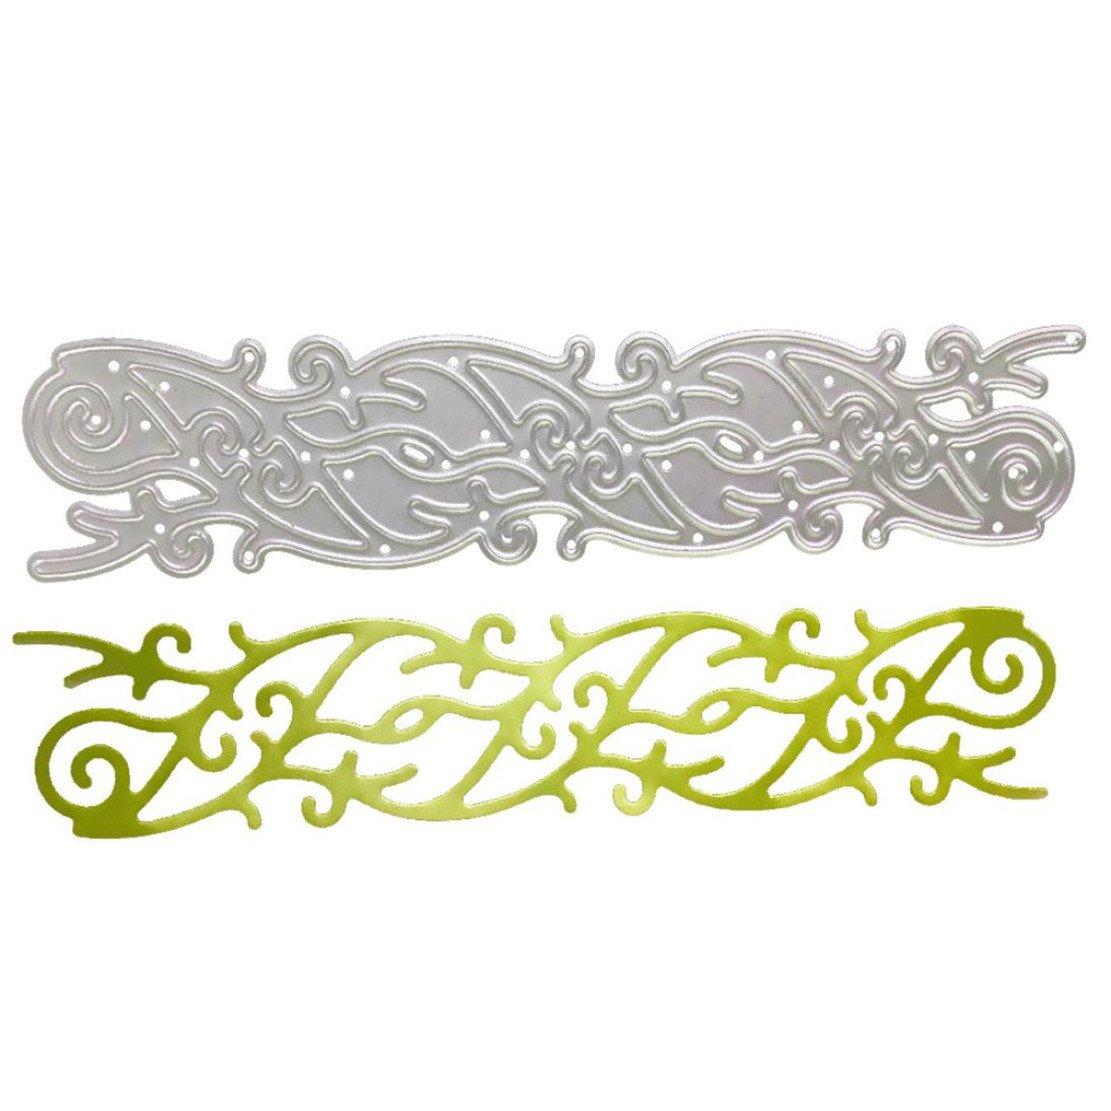 Bringbring Snowflake Metal Cutting Dies Craft Stencils DIY Scrapbooking Album Paper Card